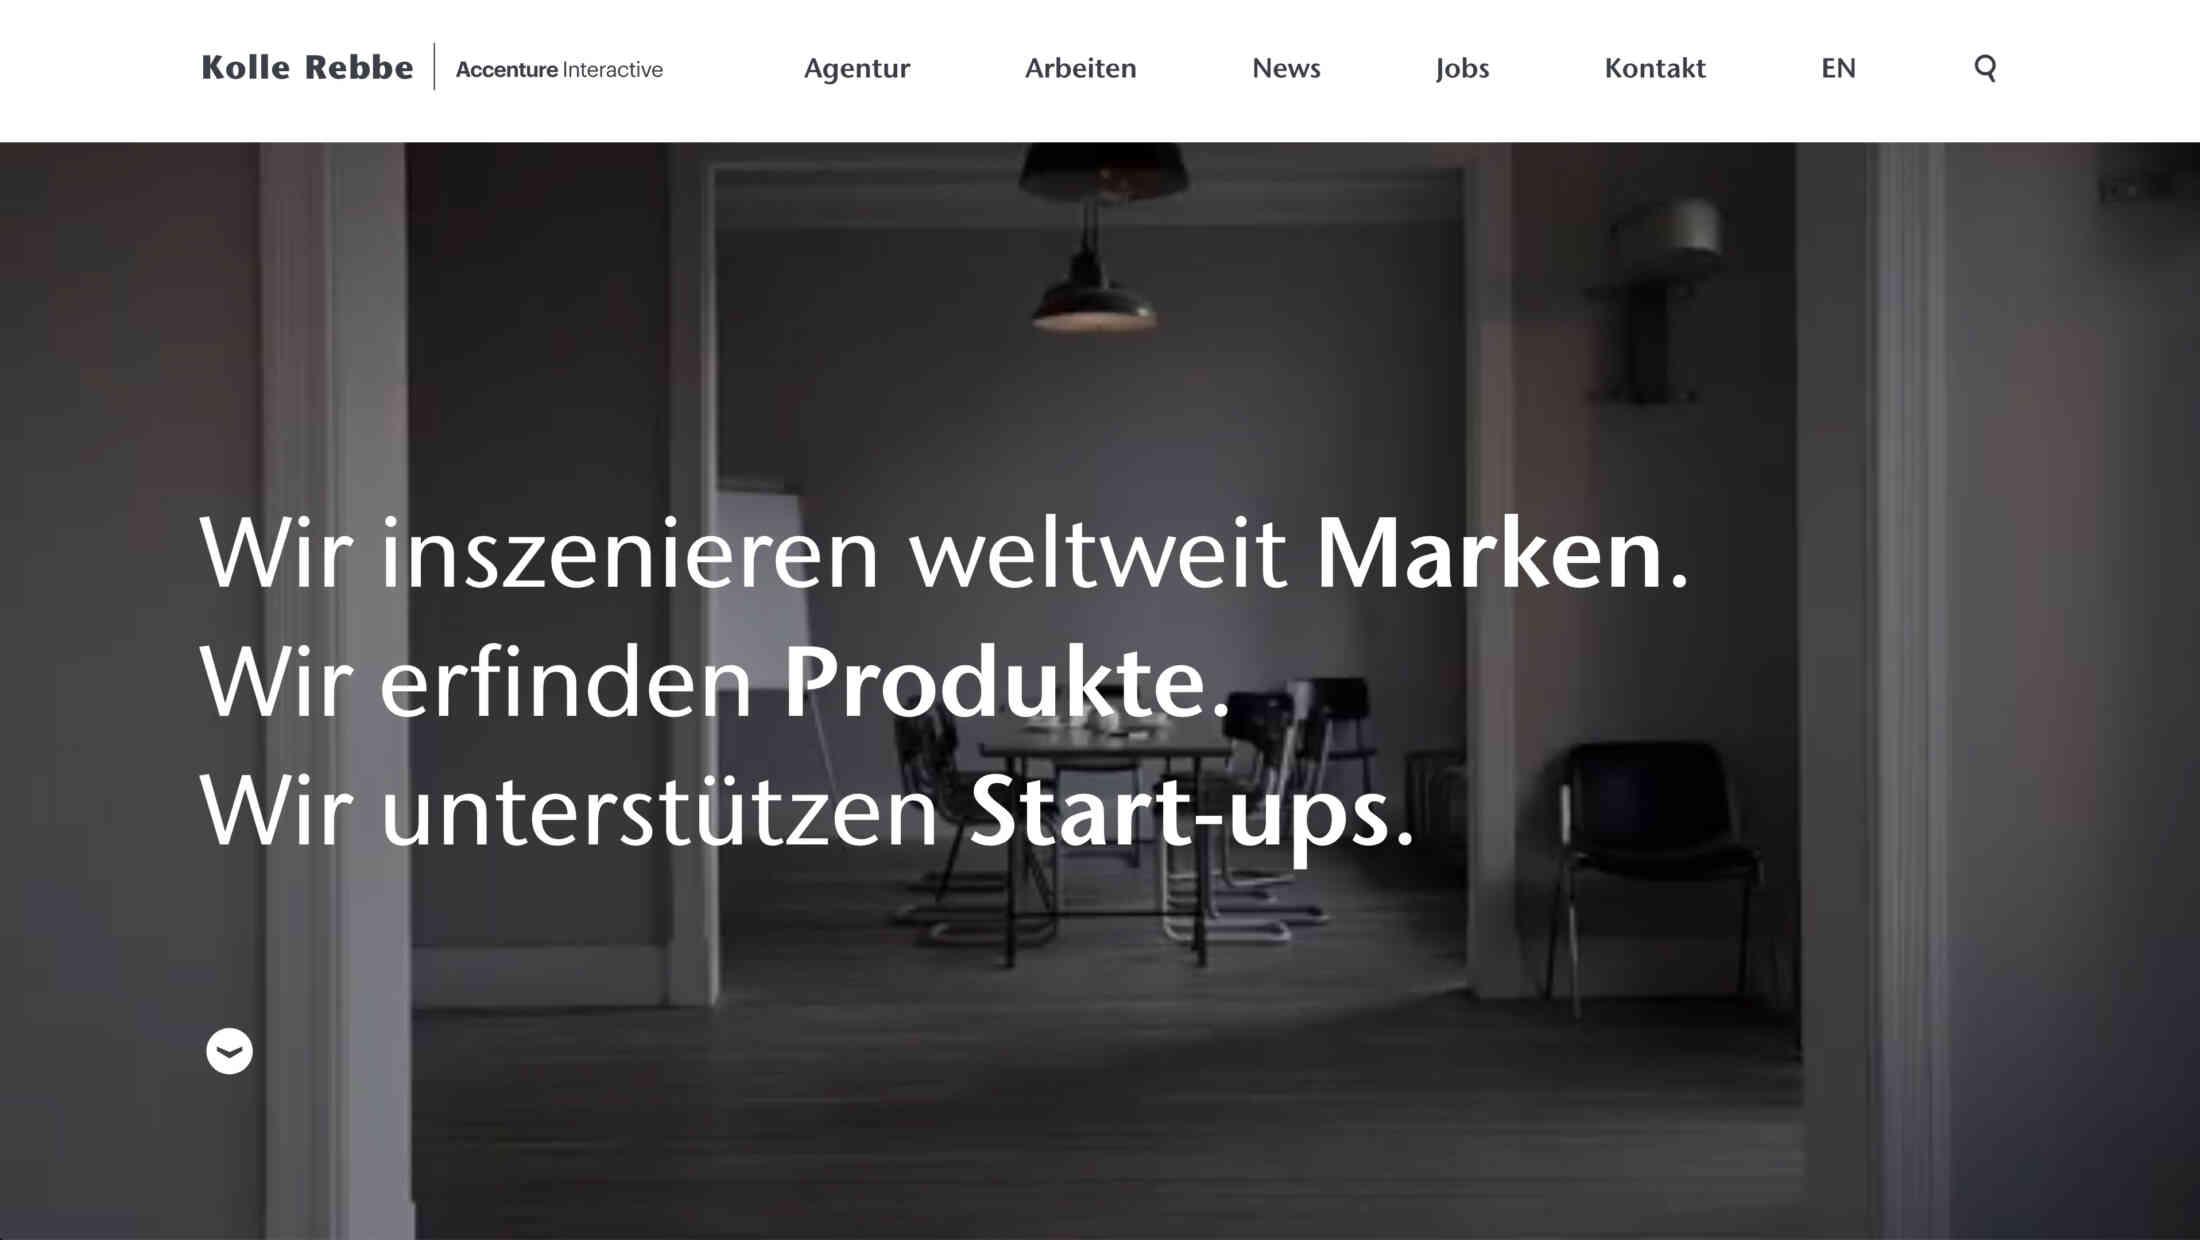 https://www.elfacht.com/uploads/portfolio/_portfolioHd/portfolio_kolle-rebbe.jpg